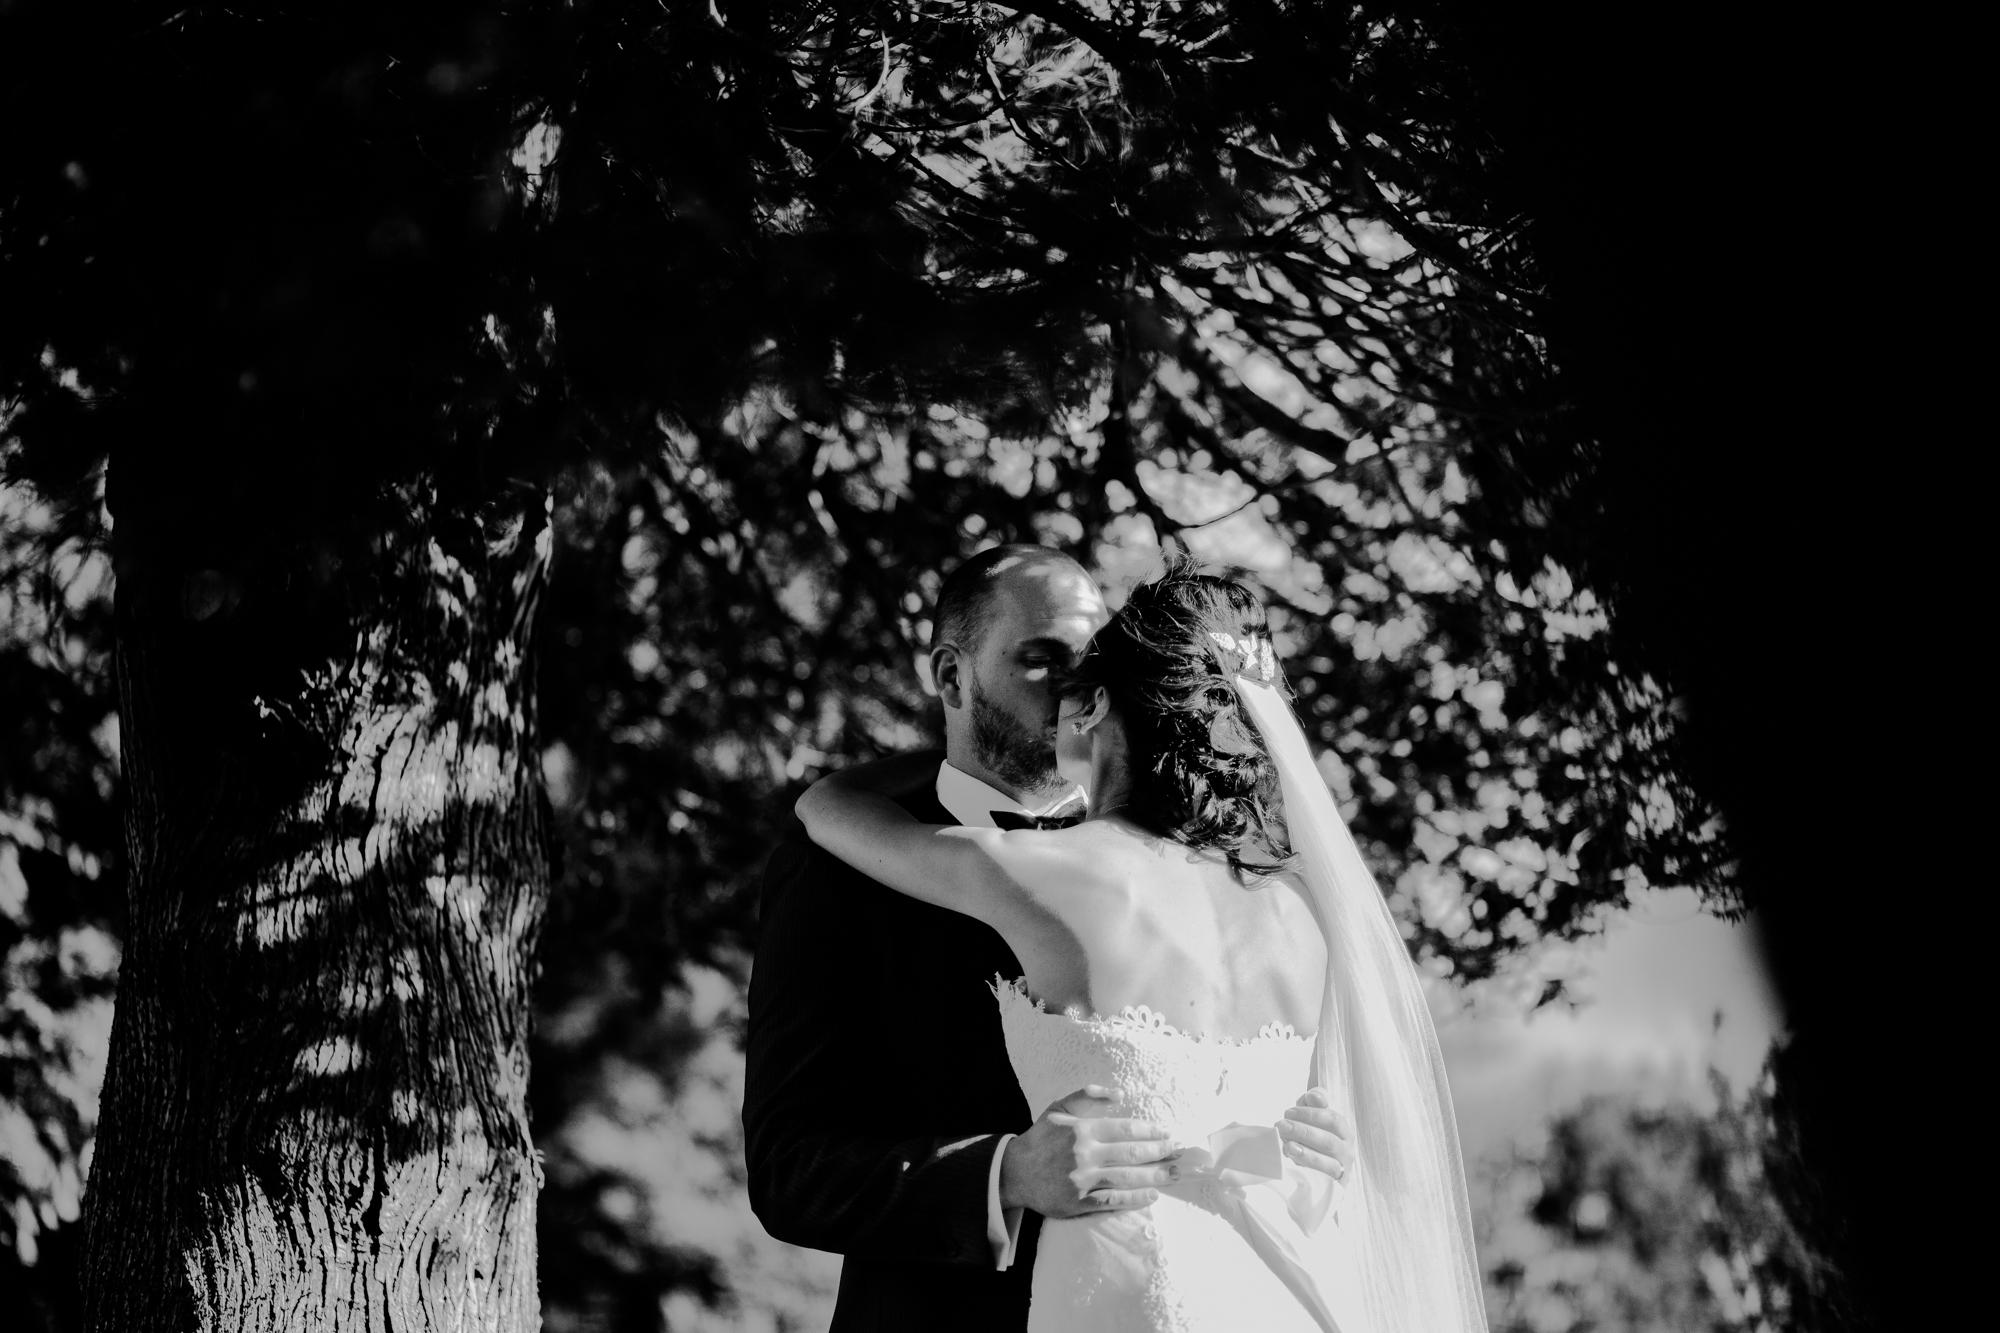 Laura & James - Sansom Wedding Photography Yorkshire-33